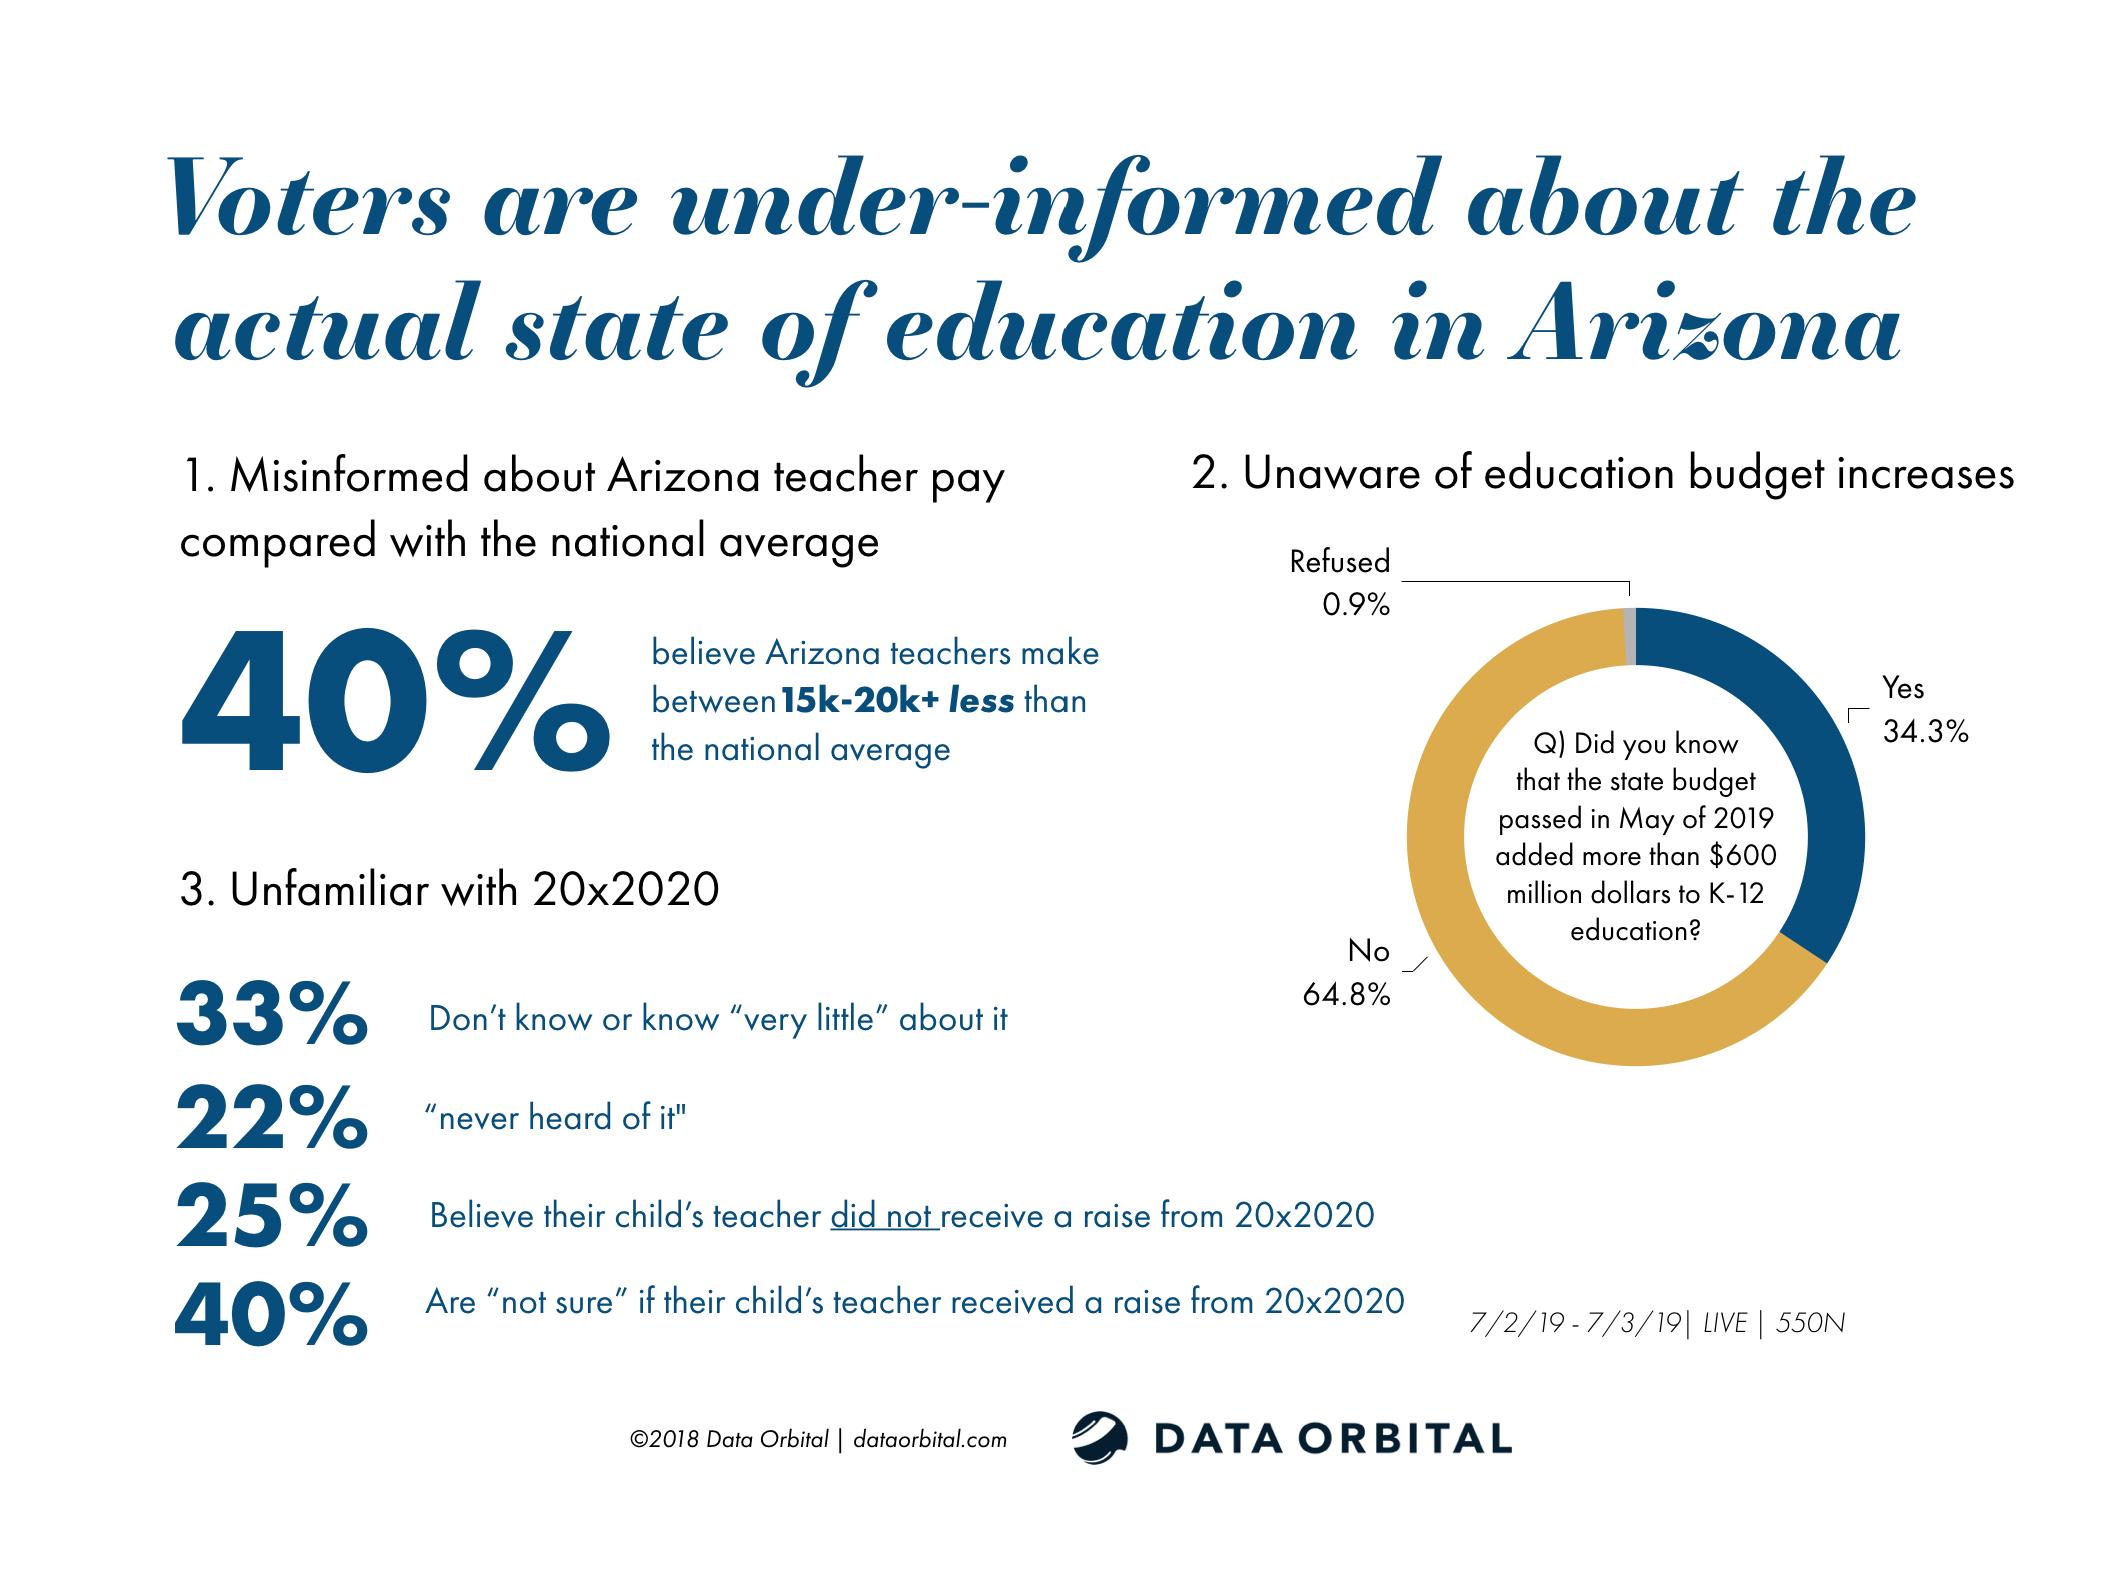 AZ Voters Under-Informed State of Education